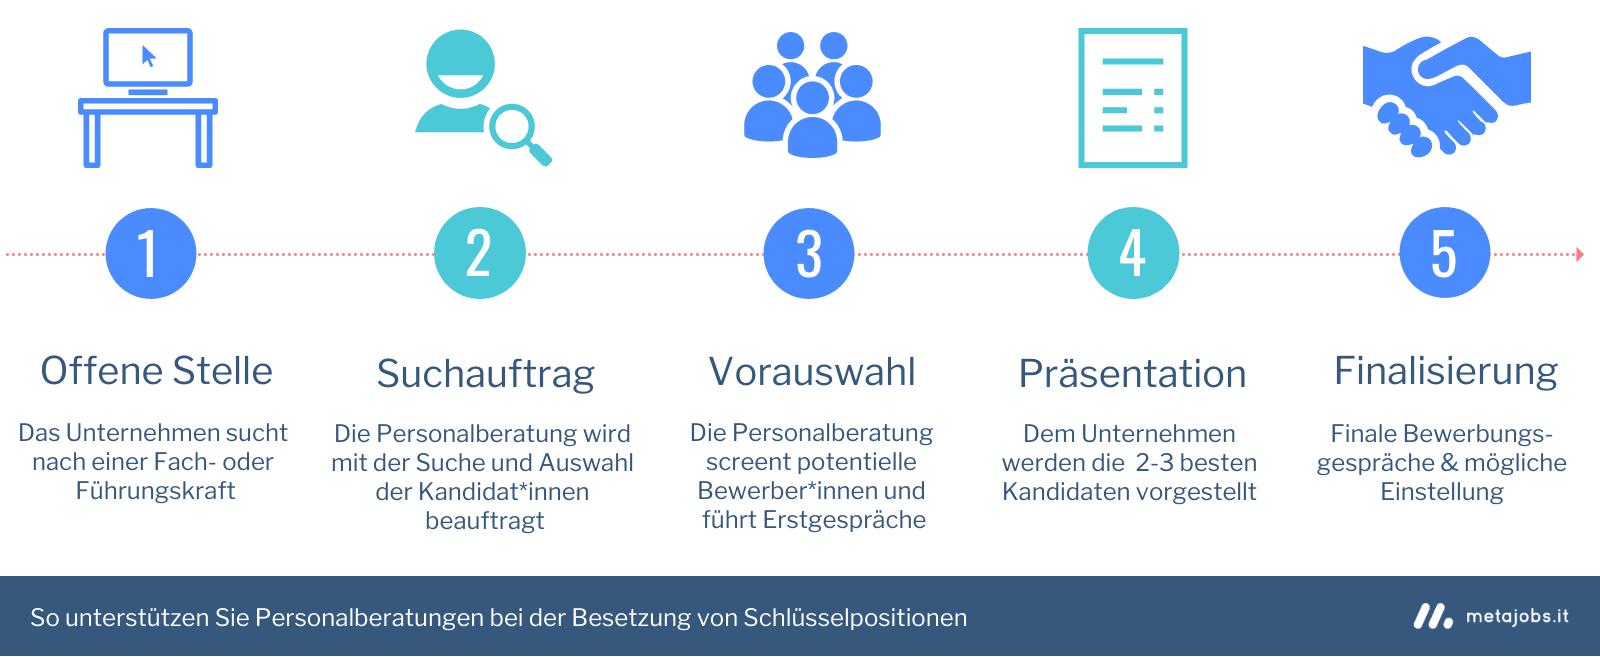 Recruiting-Kanal Personalberatung - Ablauf Infografik